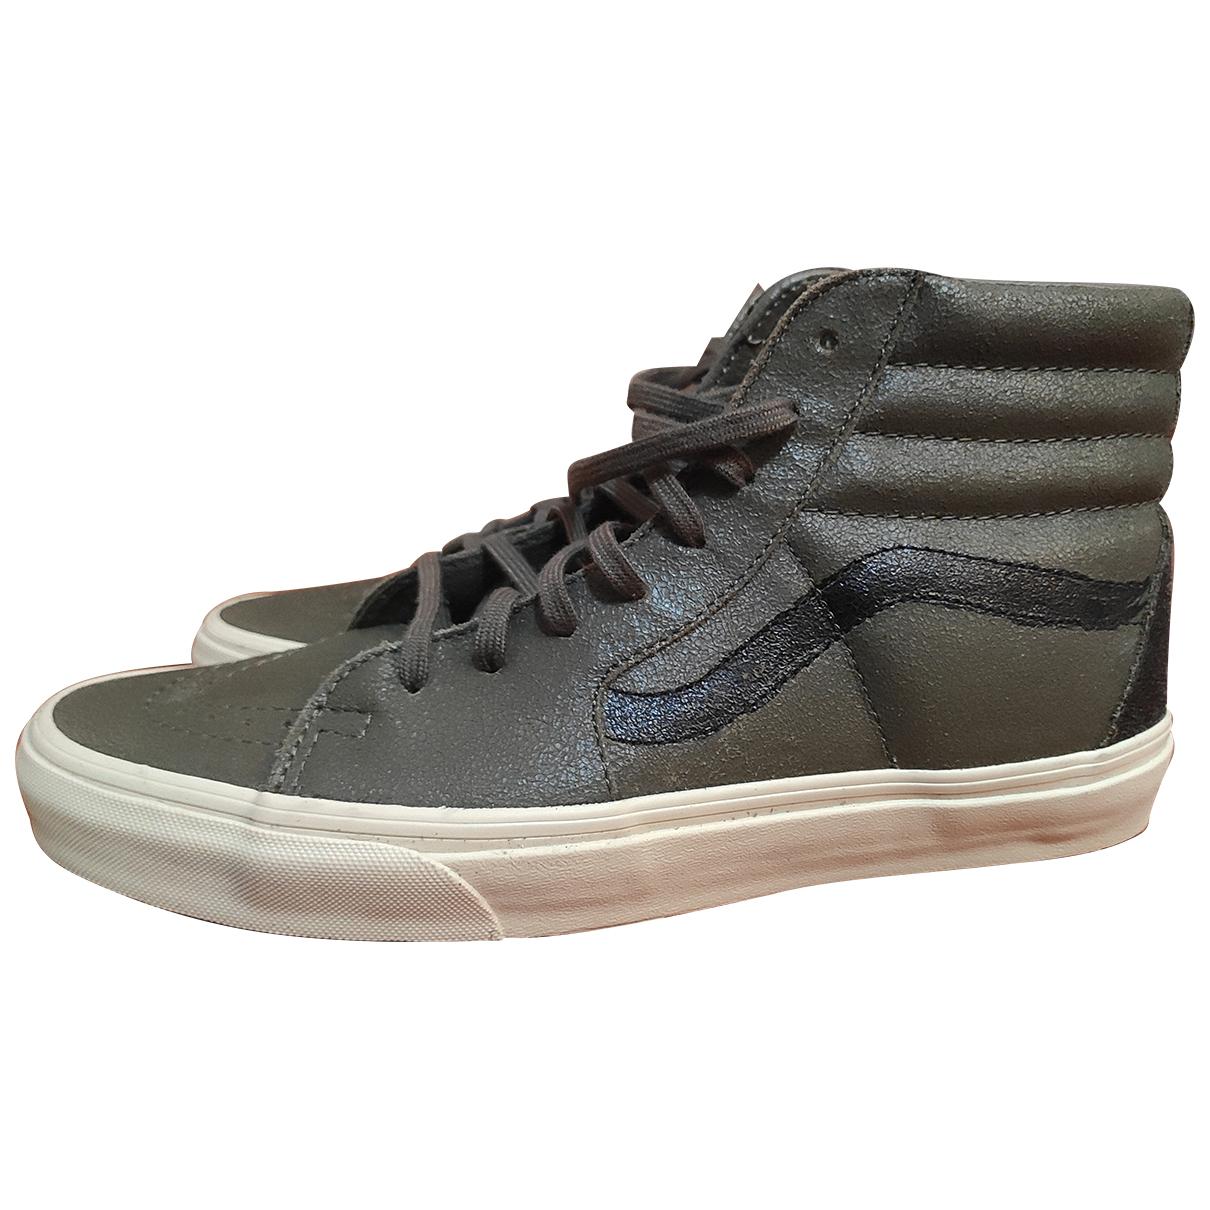 Marni \N Sneakers in  Gruen Leder